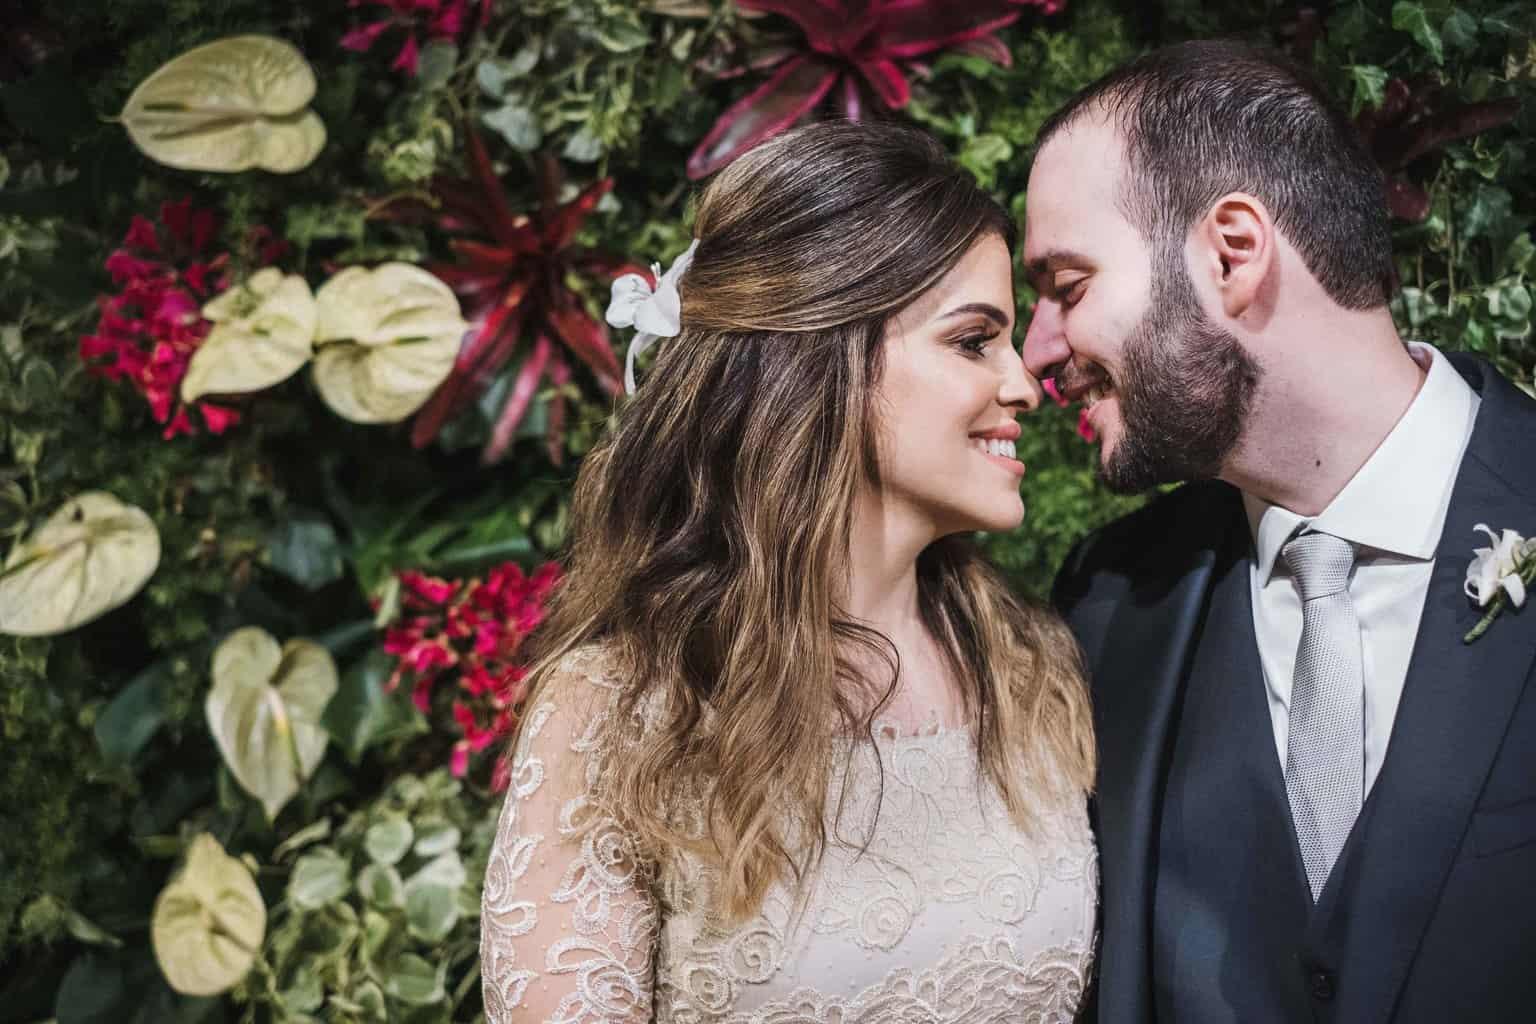 casamento-na-serra-Fotografia-Renata-Xavier-fotos-dos-noivos-Les-Amies-Cerimonial-Locanda-Della-Mimosa-Natalia-e-Bruno501